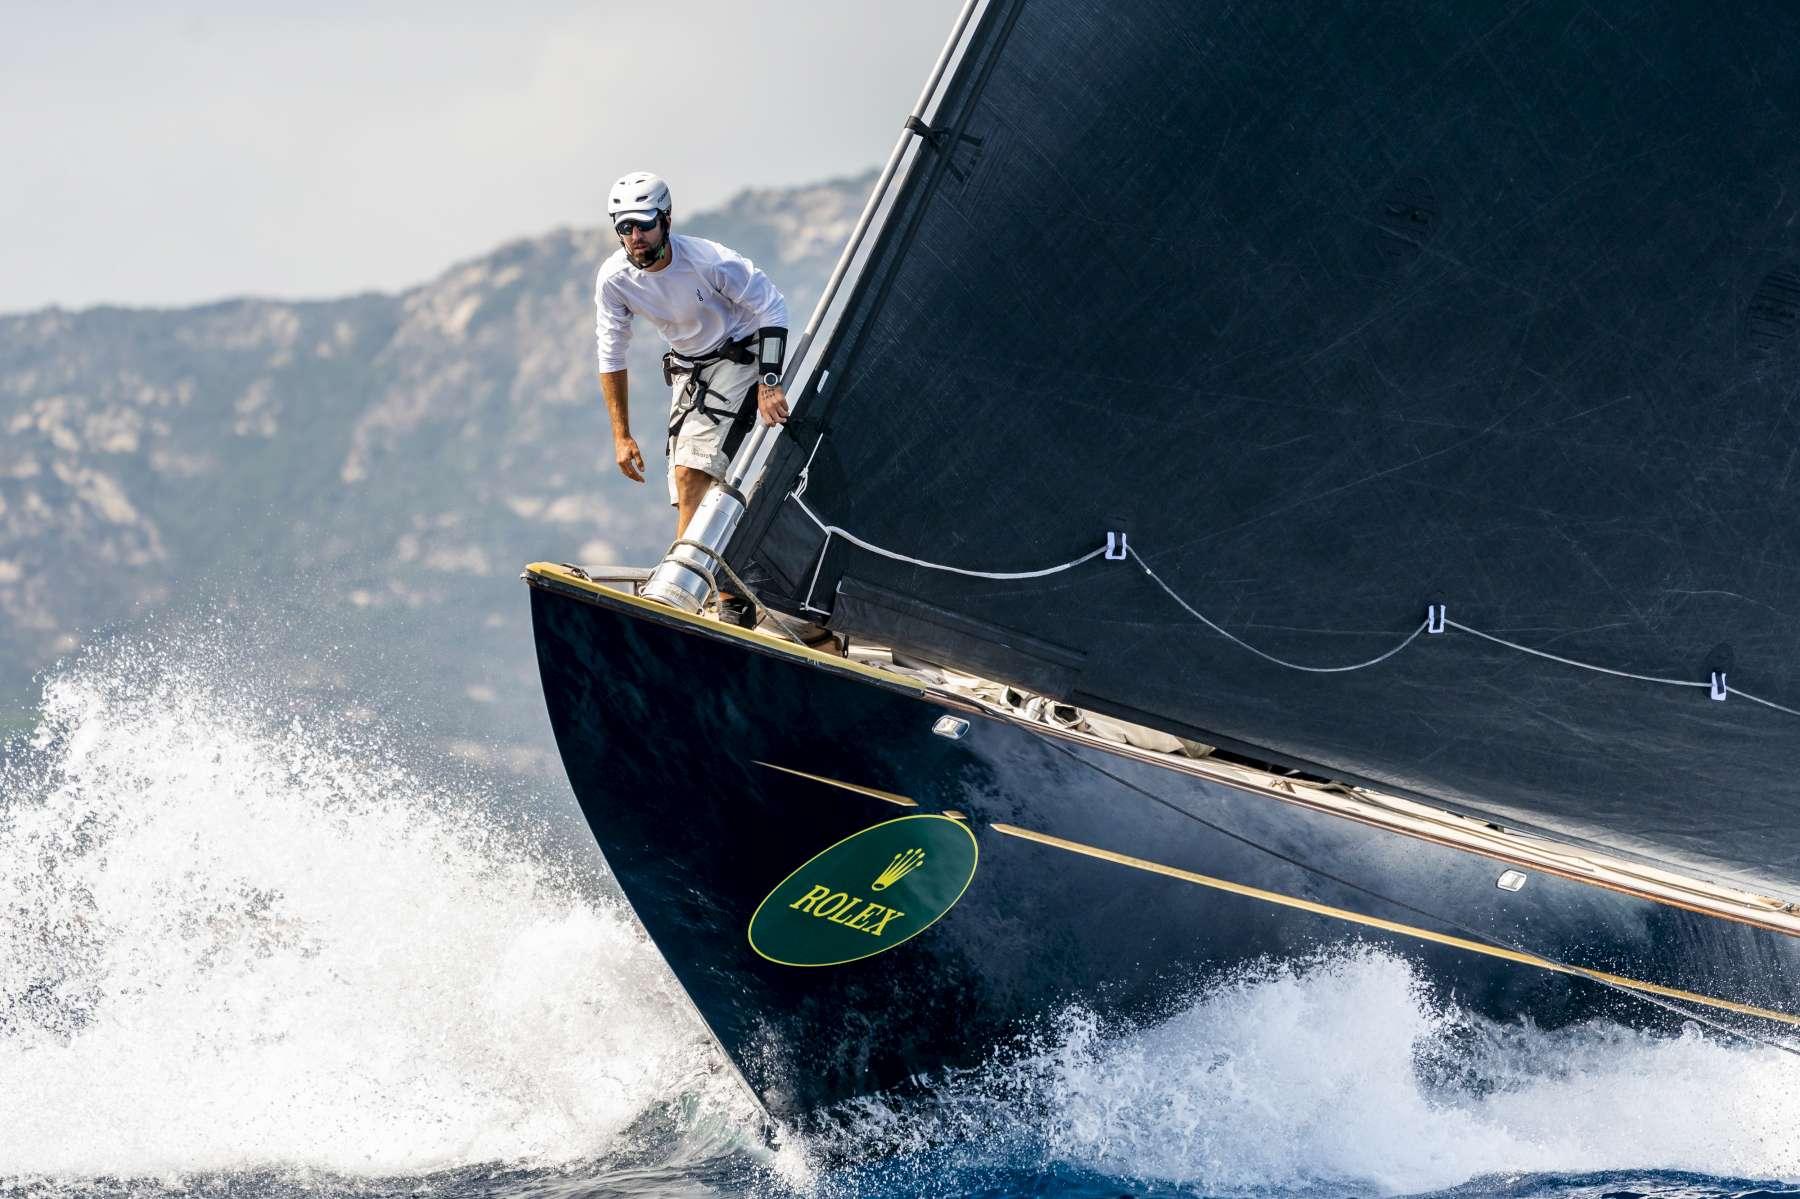 Maxi Yacht Rolex Cup: leaderboard starts to take shape - NEWS - Yacht Club Costa Smeralda